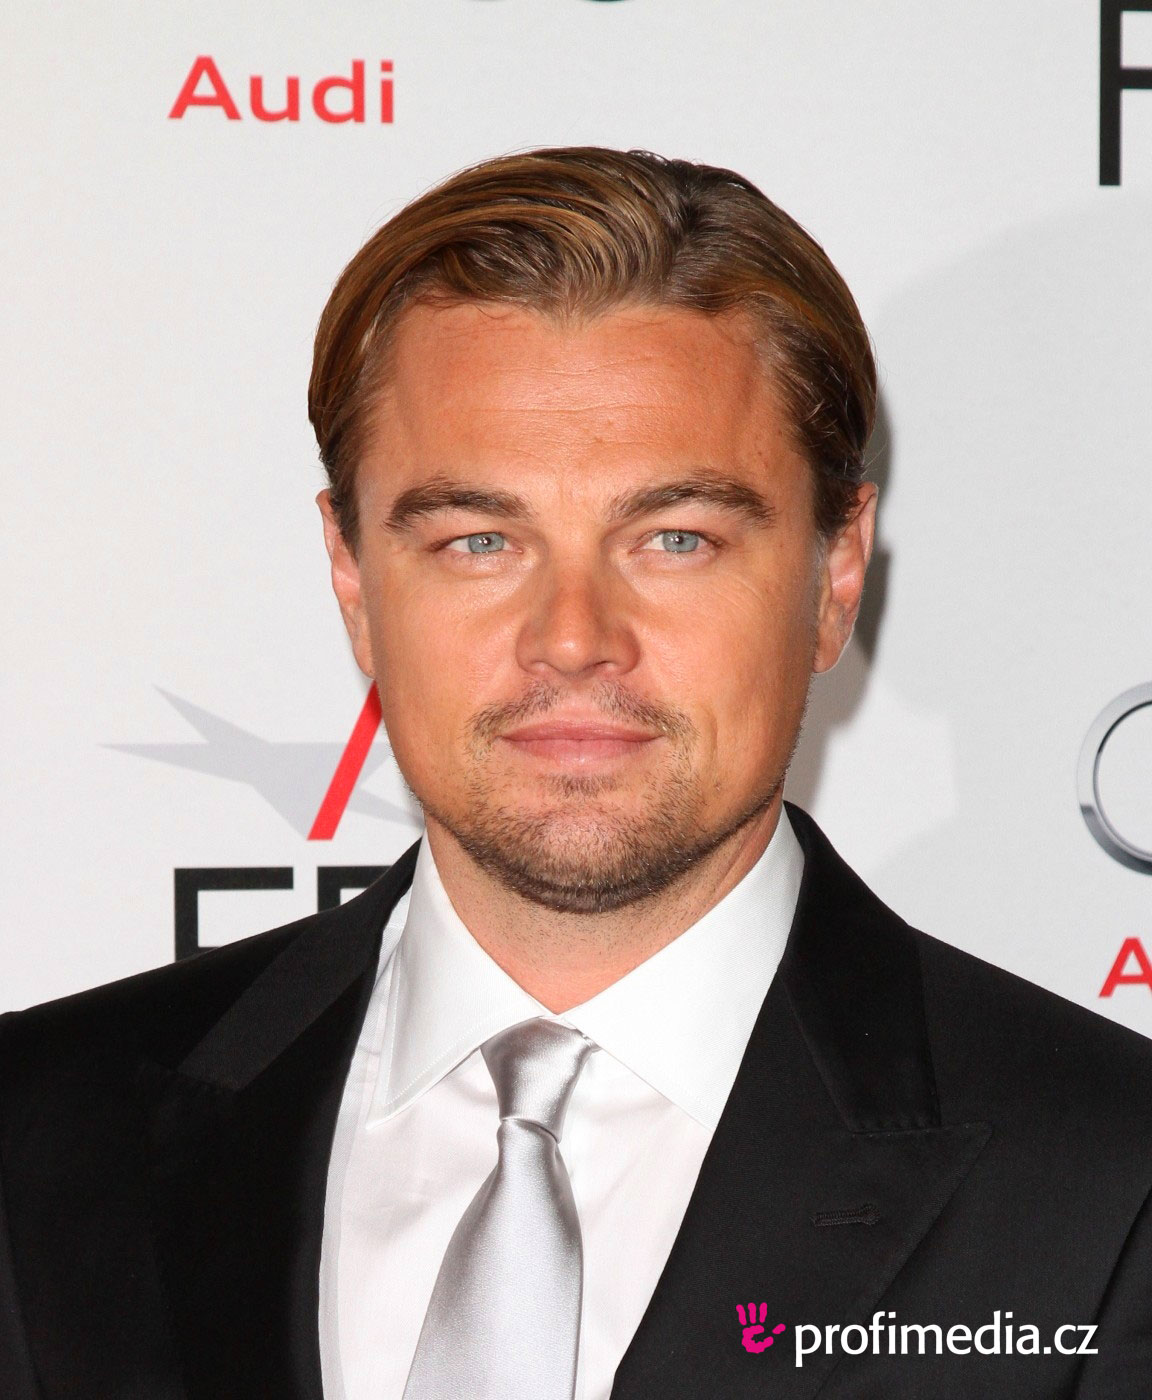 Leonardo DiCaprio - Images Colection